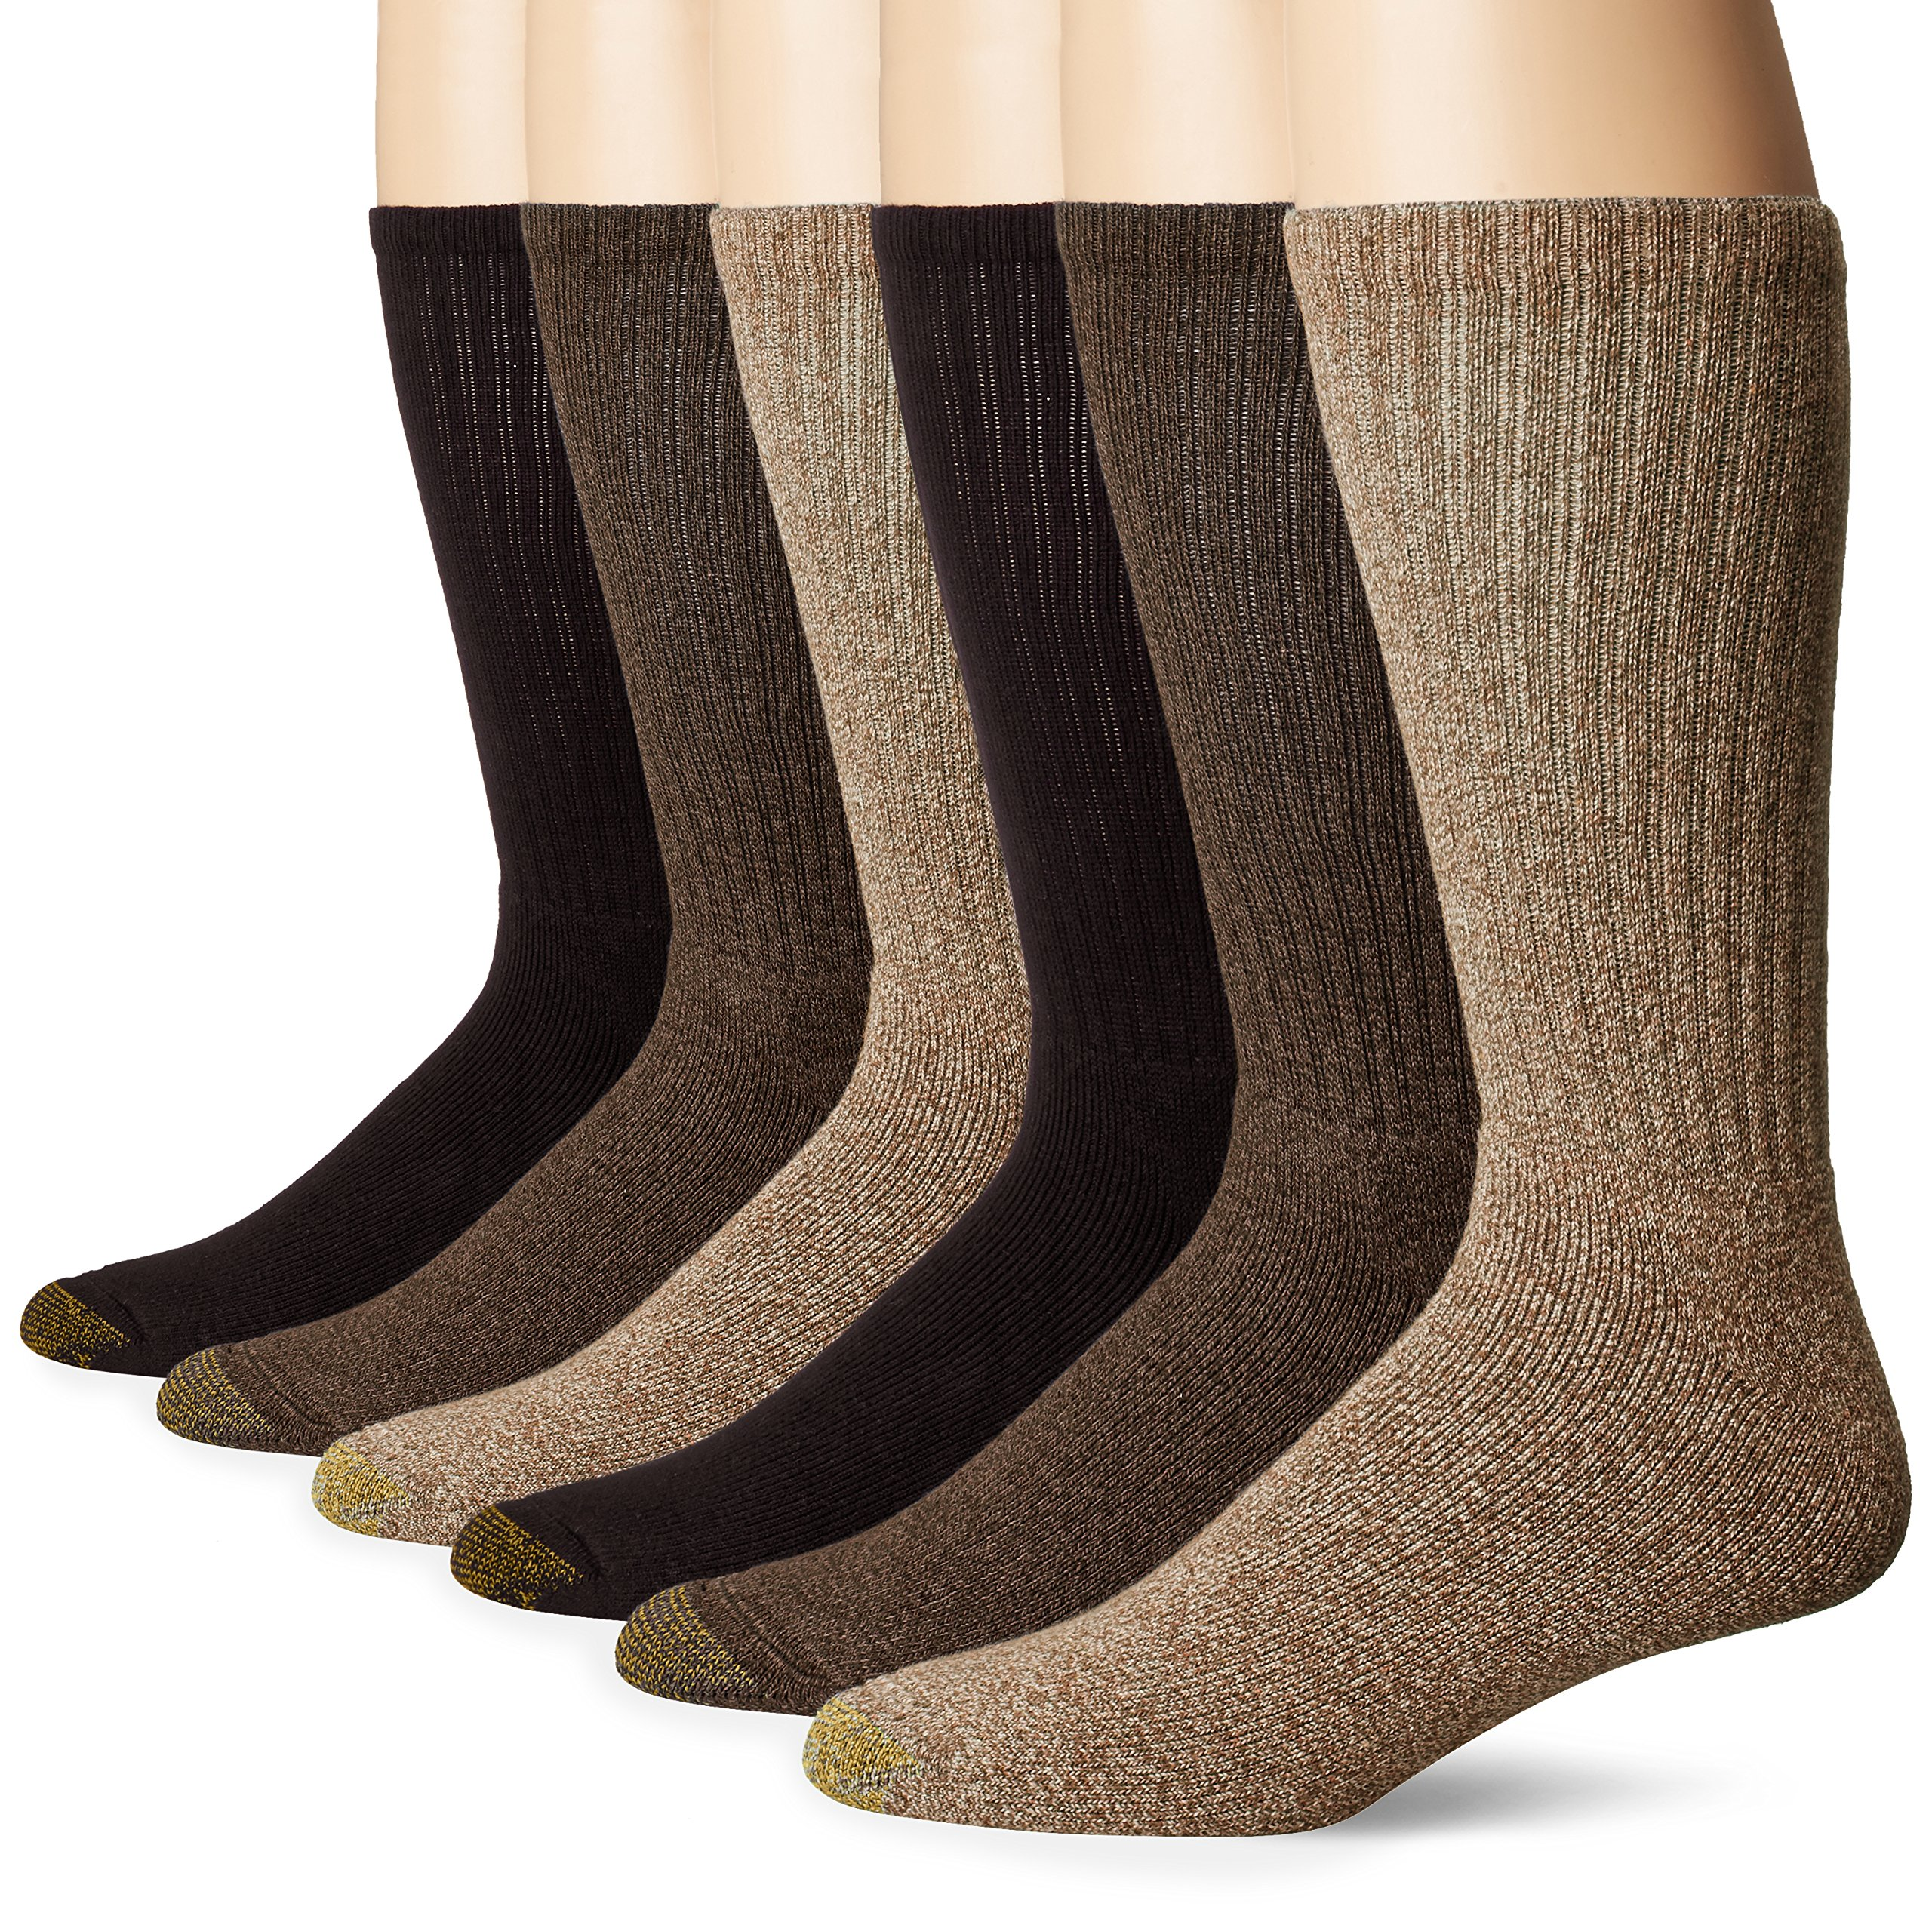 Gold Toe Men's Harrington Crew 6 Pack, Taupe Marl/Khaki Marl/Brown, Shoe Size: 6-12.5